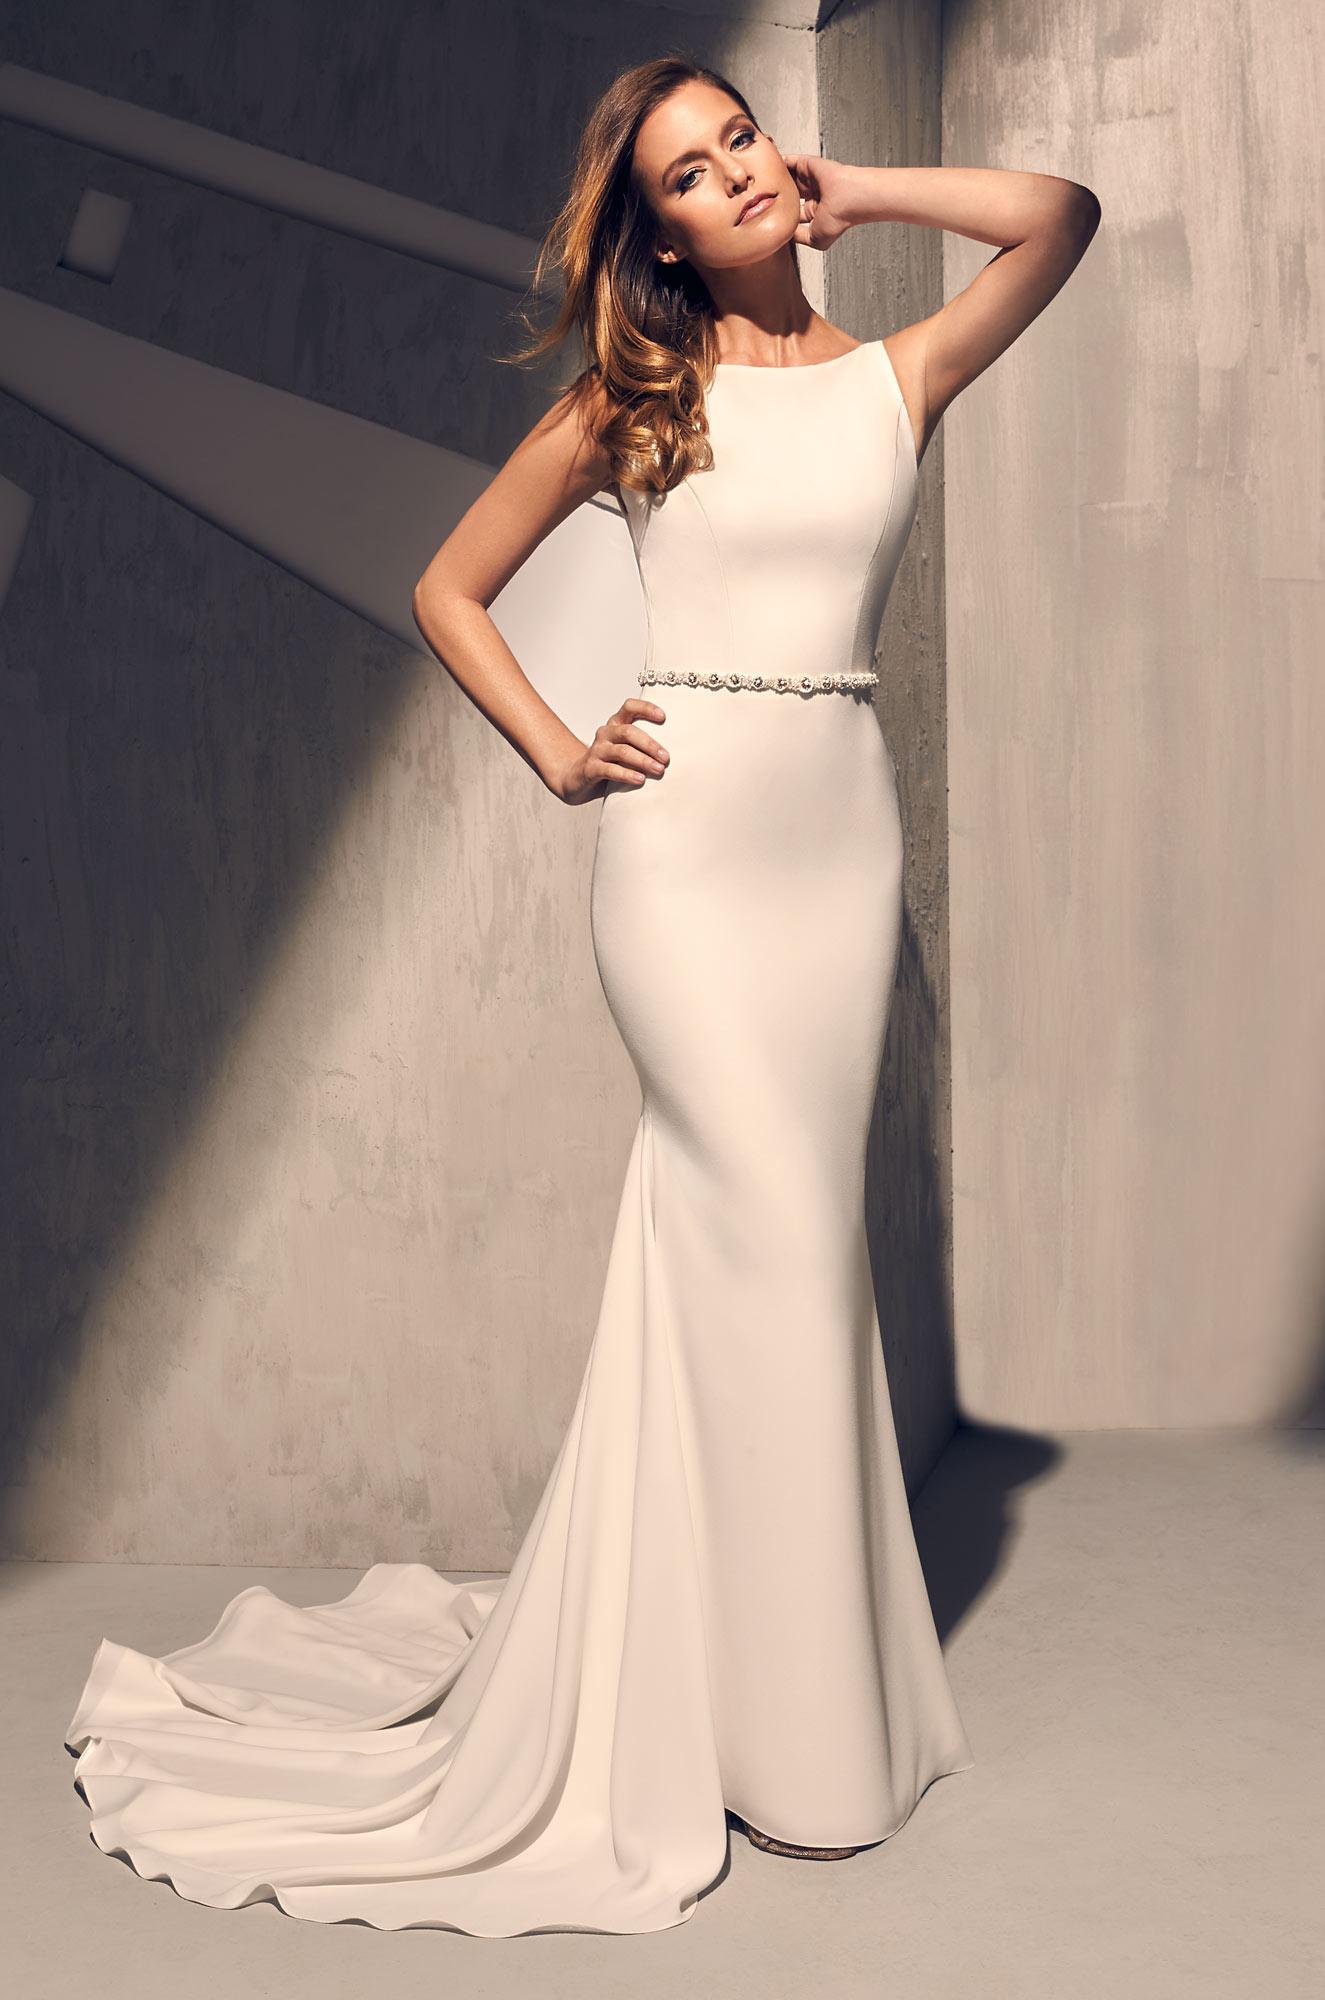 17 Chic, Minimal Wedding Dresses for Modern Brides images 8